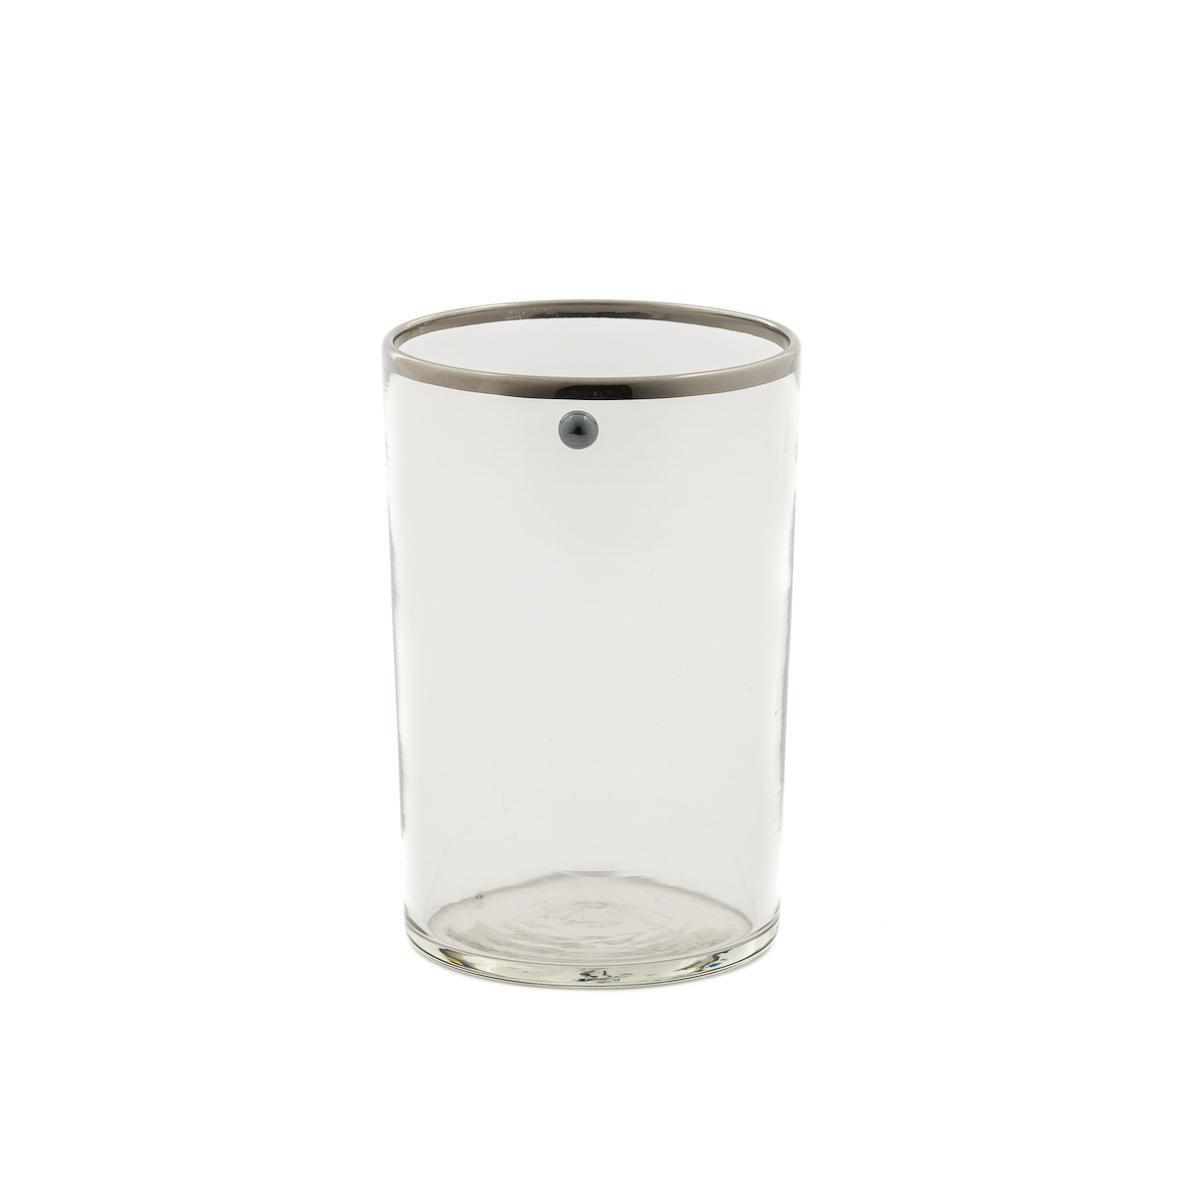 isabelle-water-glass-designer-crystal-platinum-murano-handmade